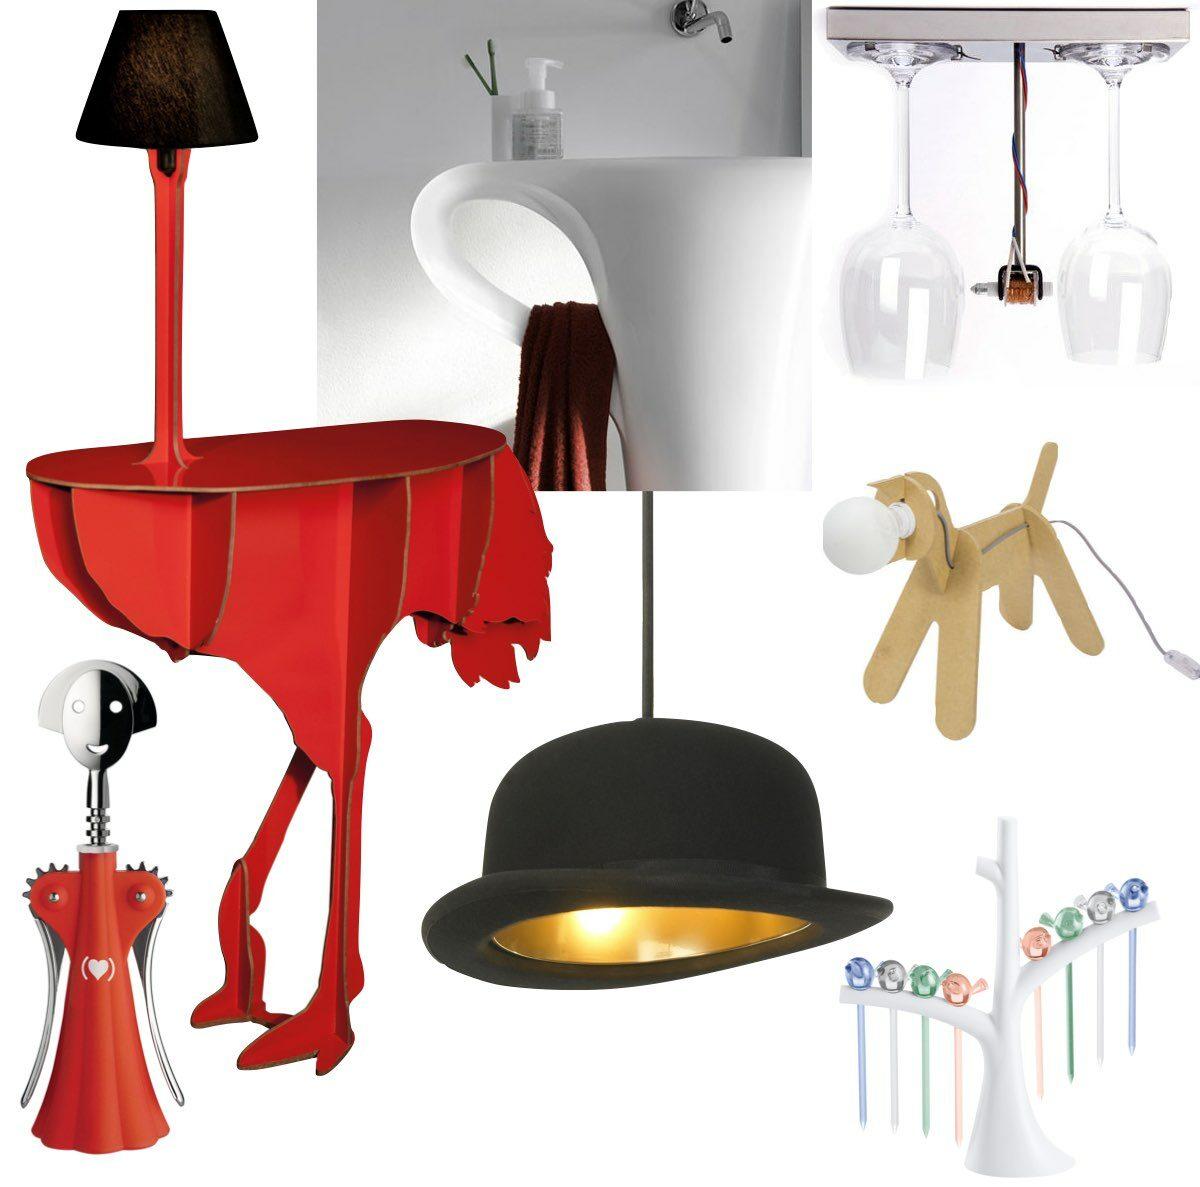 meuble original design table lampe animal chien autruche - blog déco - clem around the corner